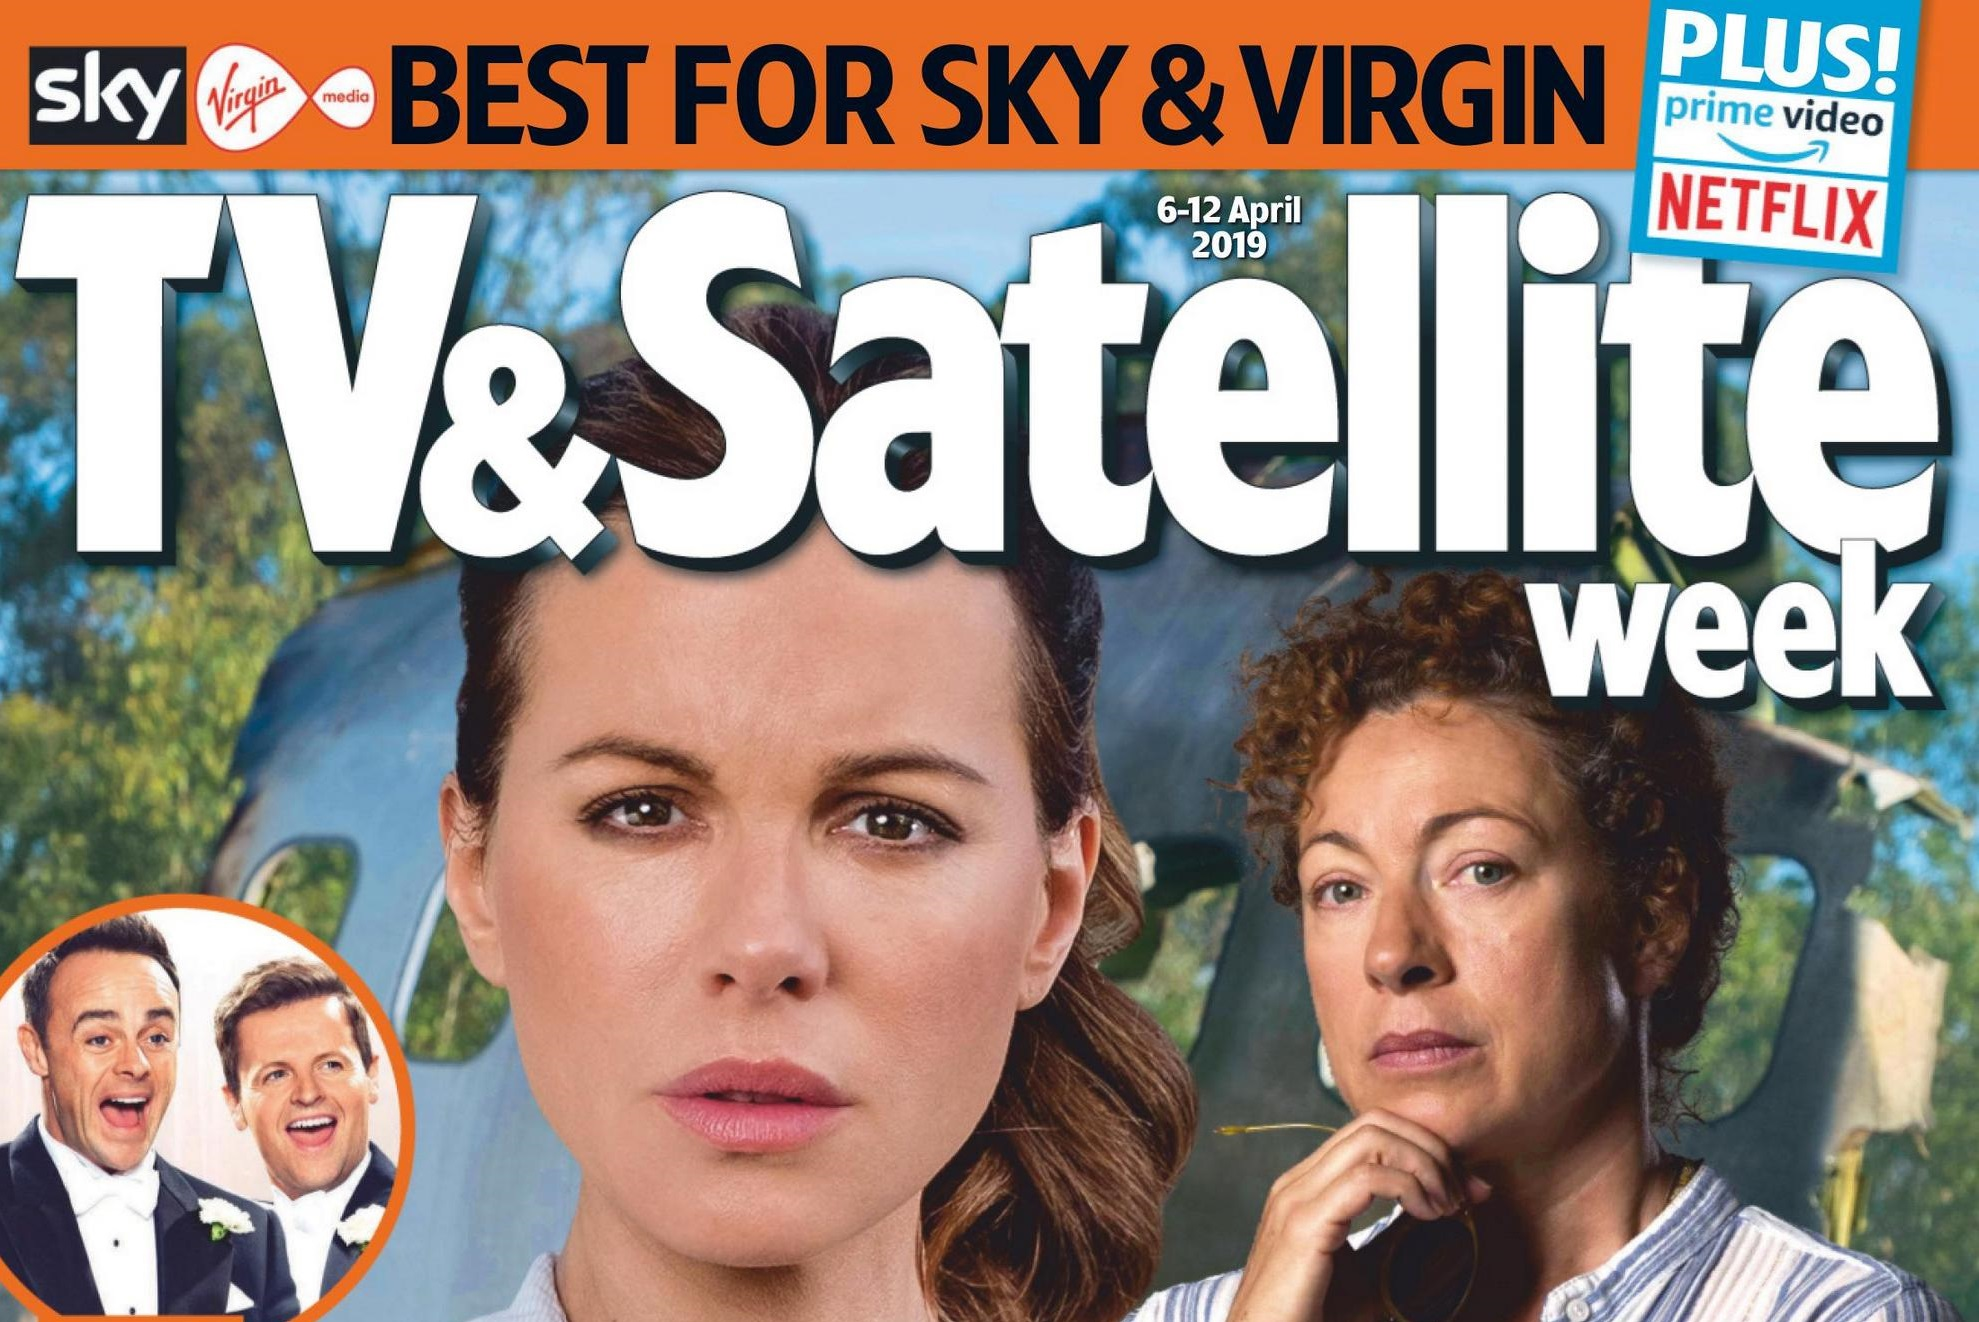 TV & Satellite Week – April 6, 2019